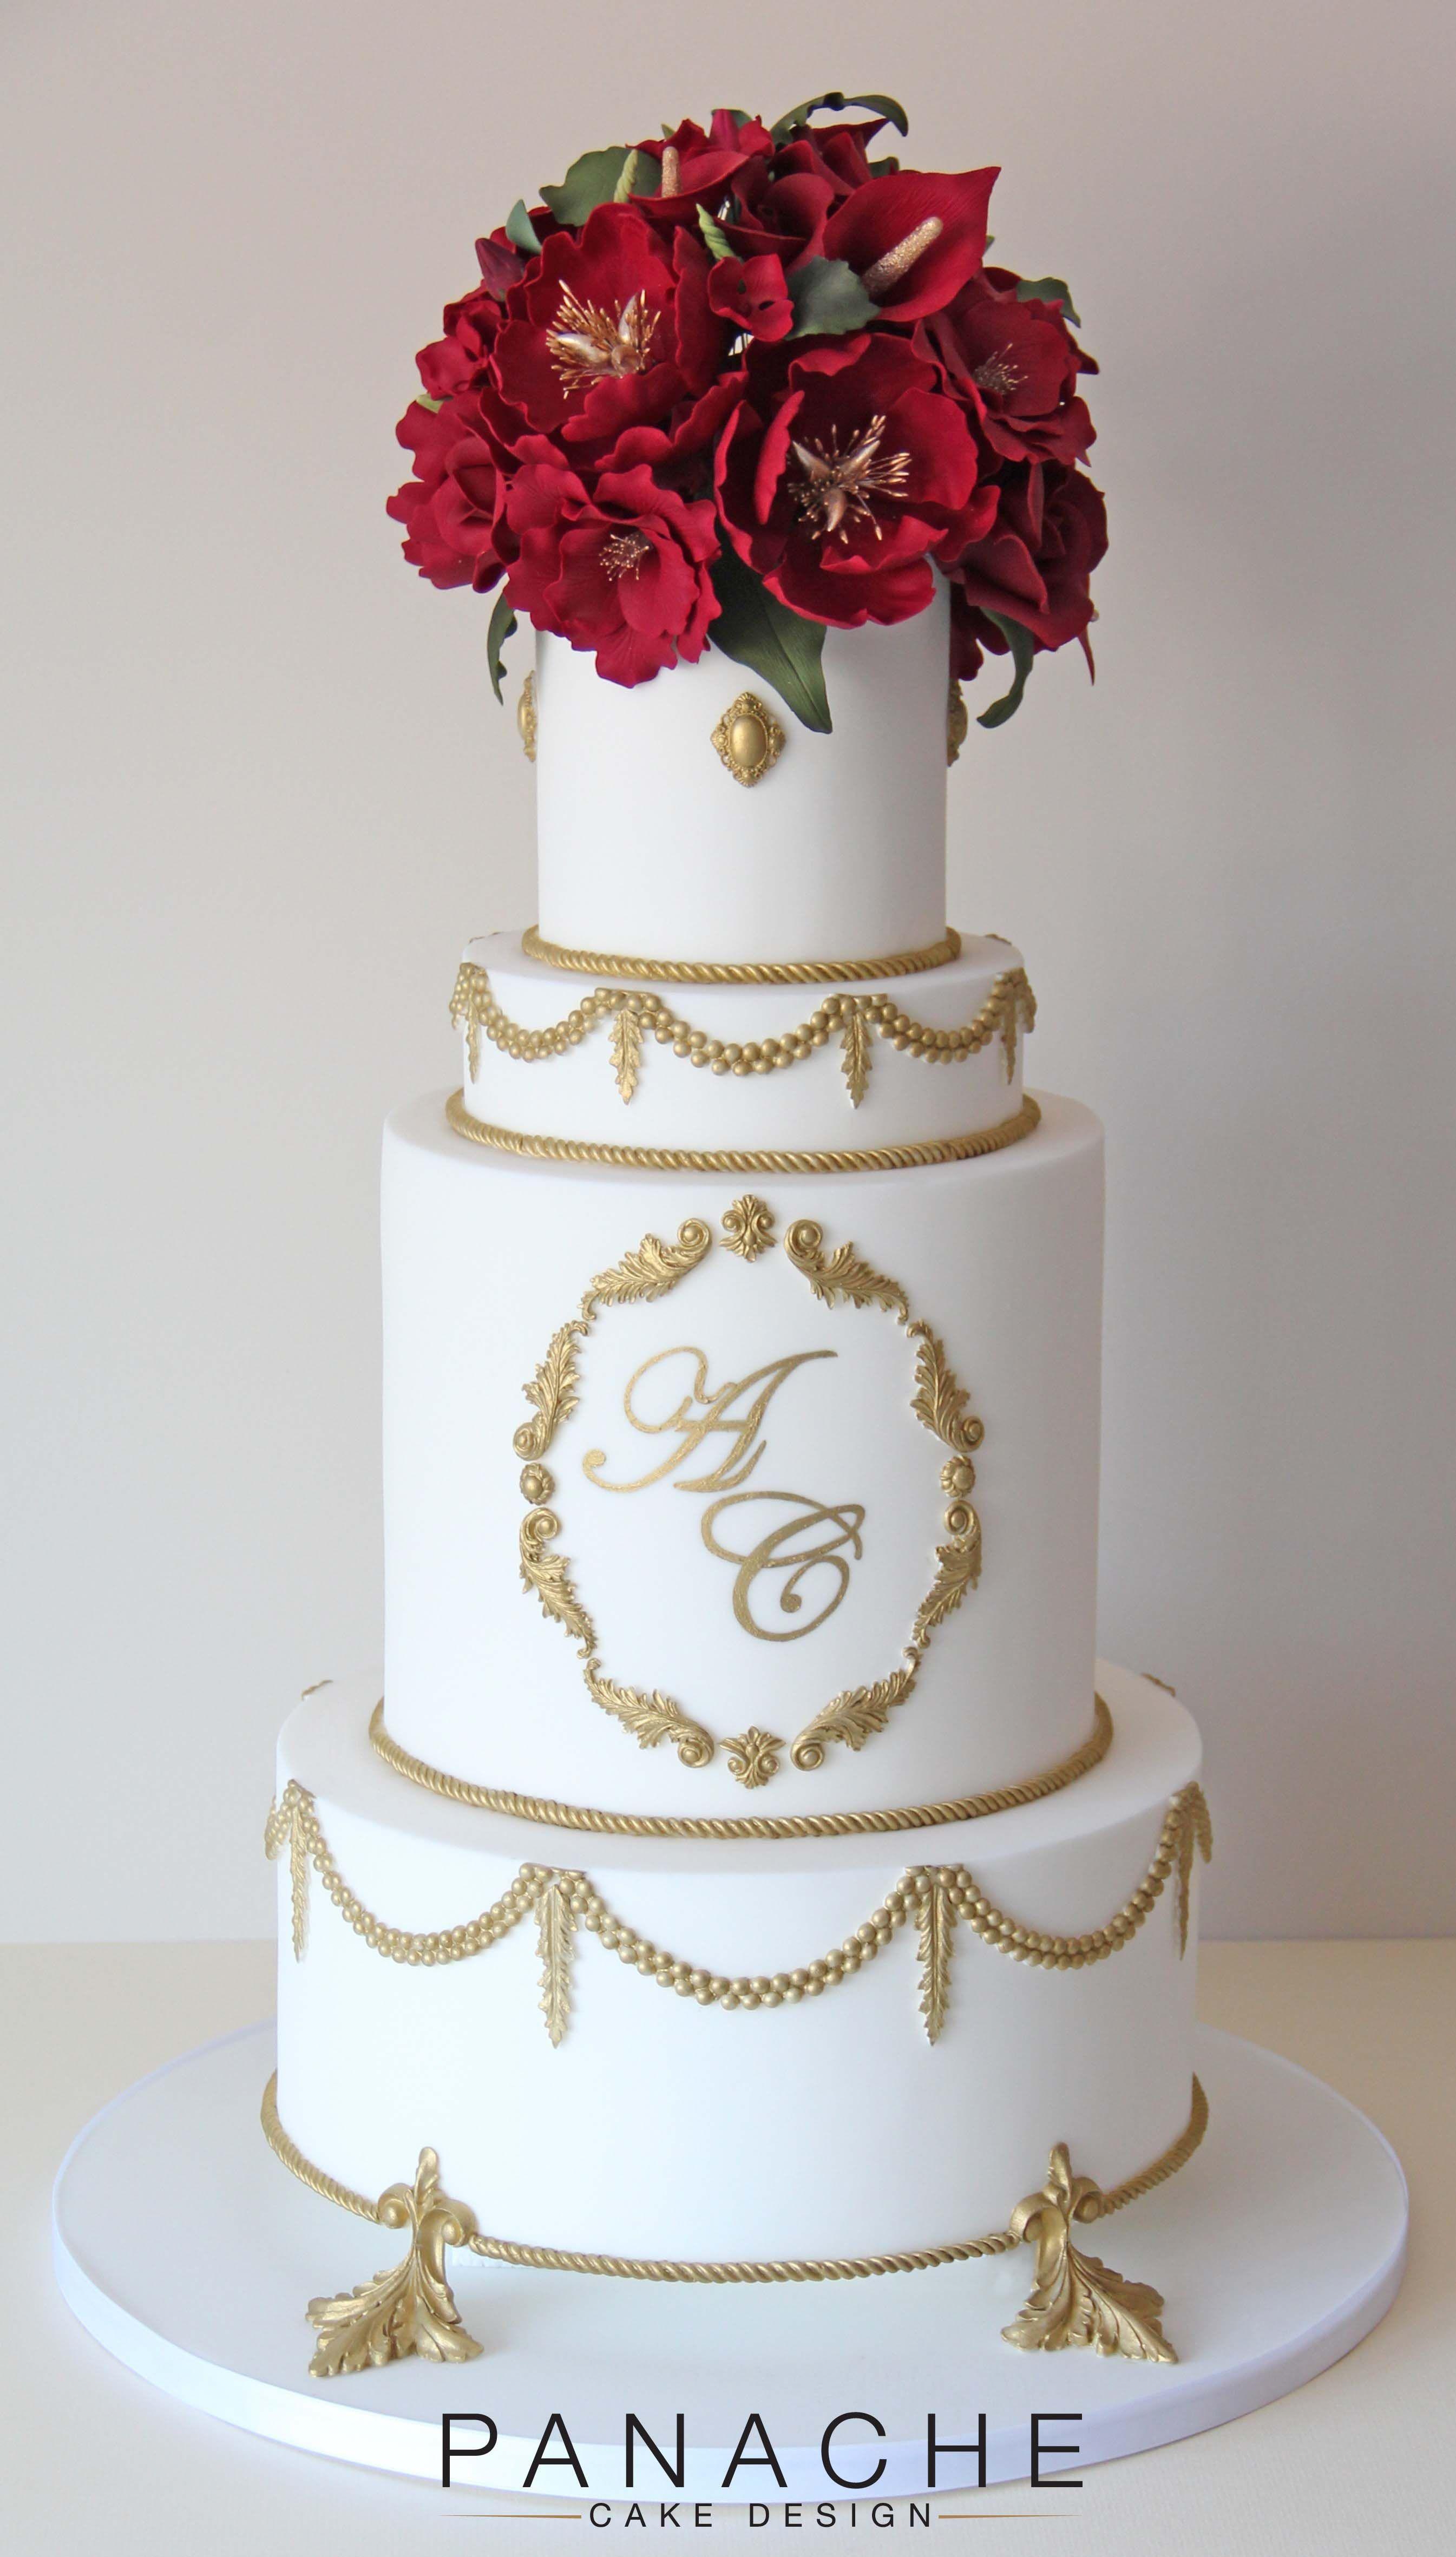 Simple Wedding Cake With Red Flowers | deweddingjpg.com